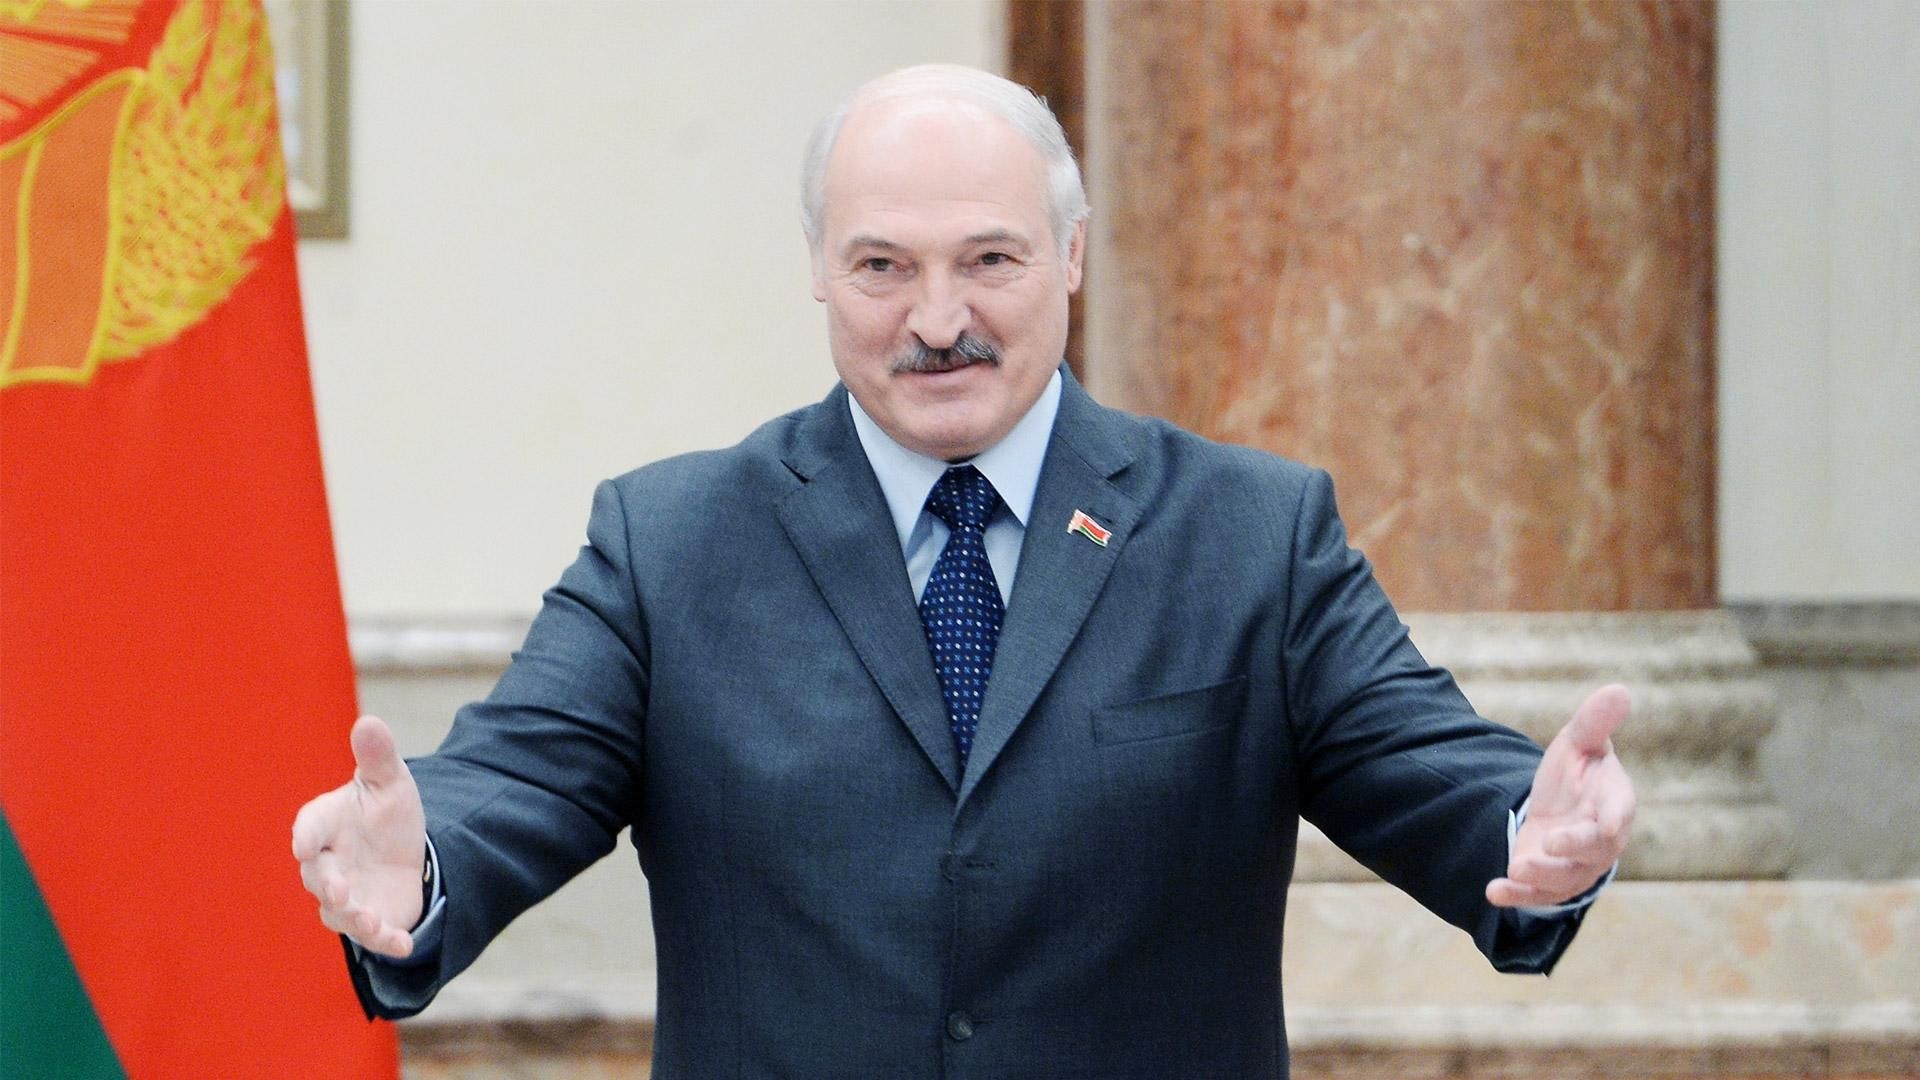 Александр Лукашенко посетит Казахстан- Kapital.kz